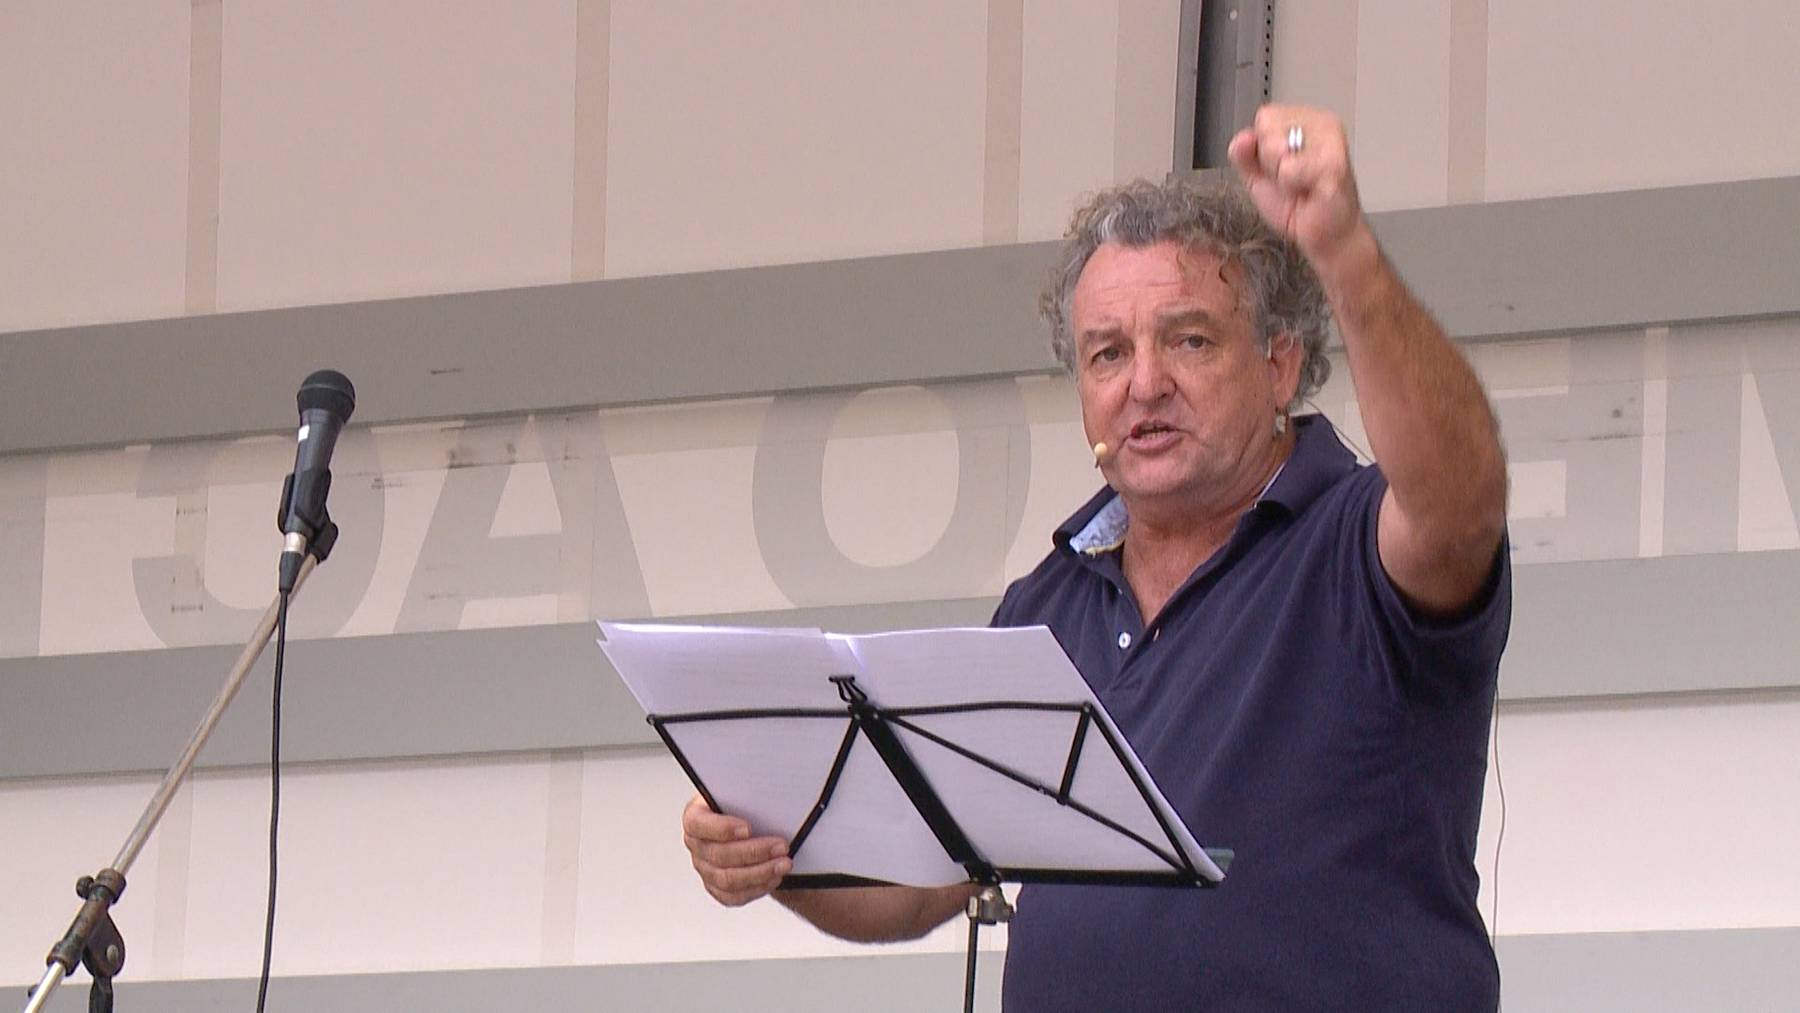 Thumb for ‹Marco Rima und Andreas Thiel an der Anti-Corona-Demo in Zürich›